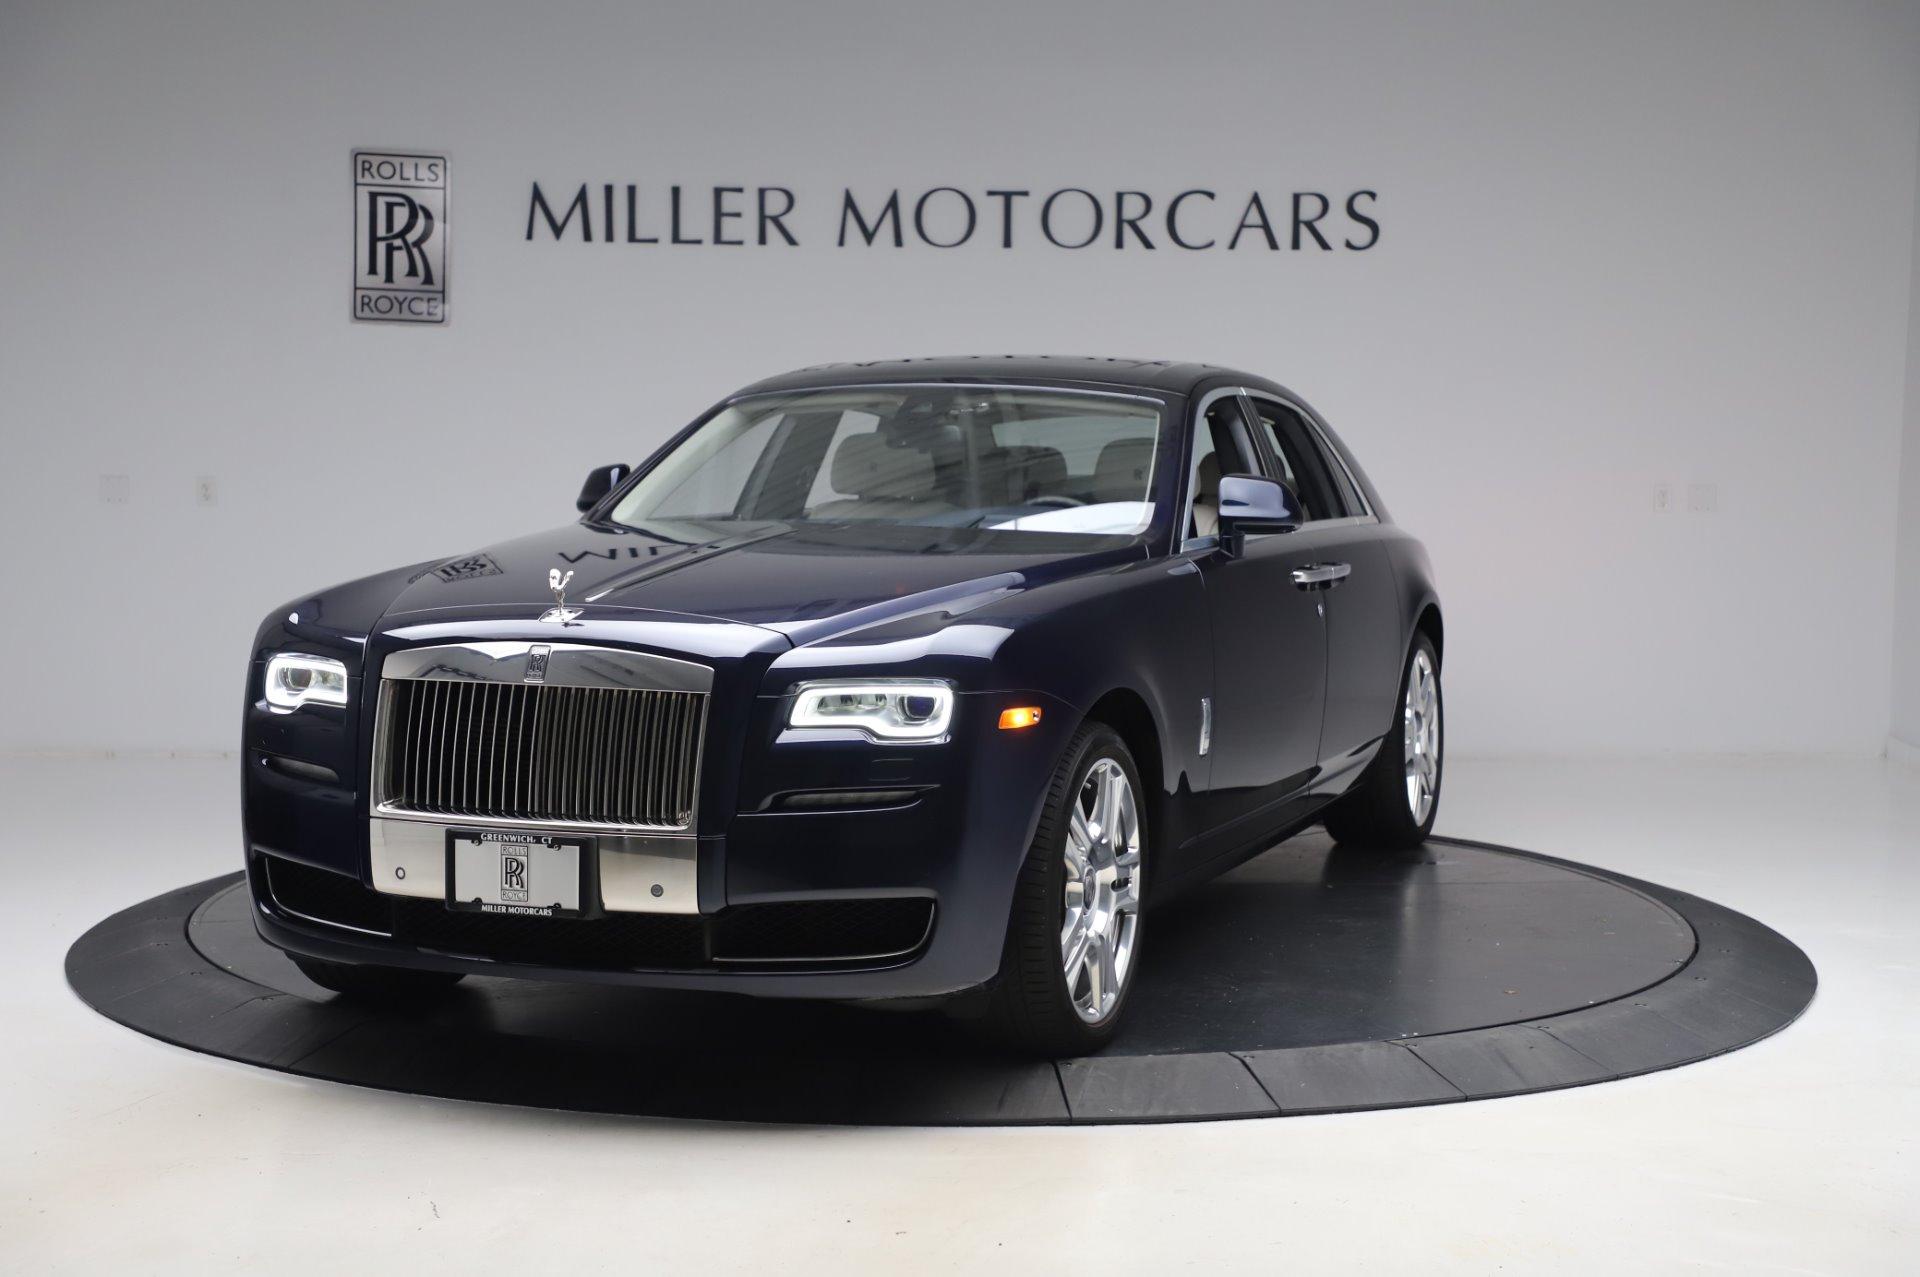 Used 2016 Rolls-Royce Ghost for sale $173,900 at Rolls-Royce Motor Cars Greenwich in Greenwich CT 06830 1